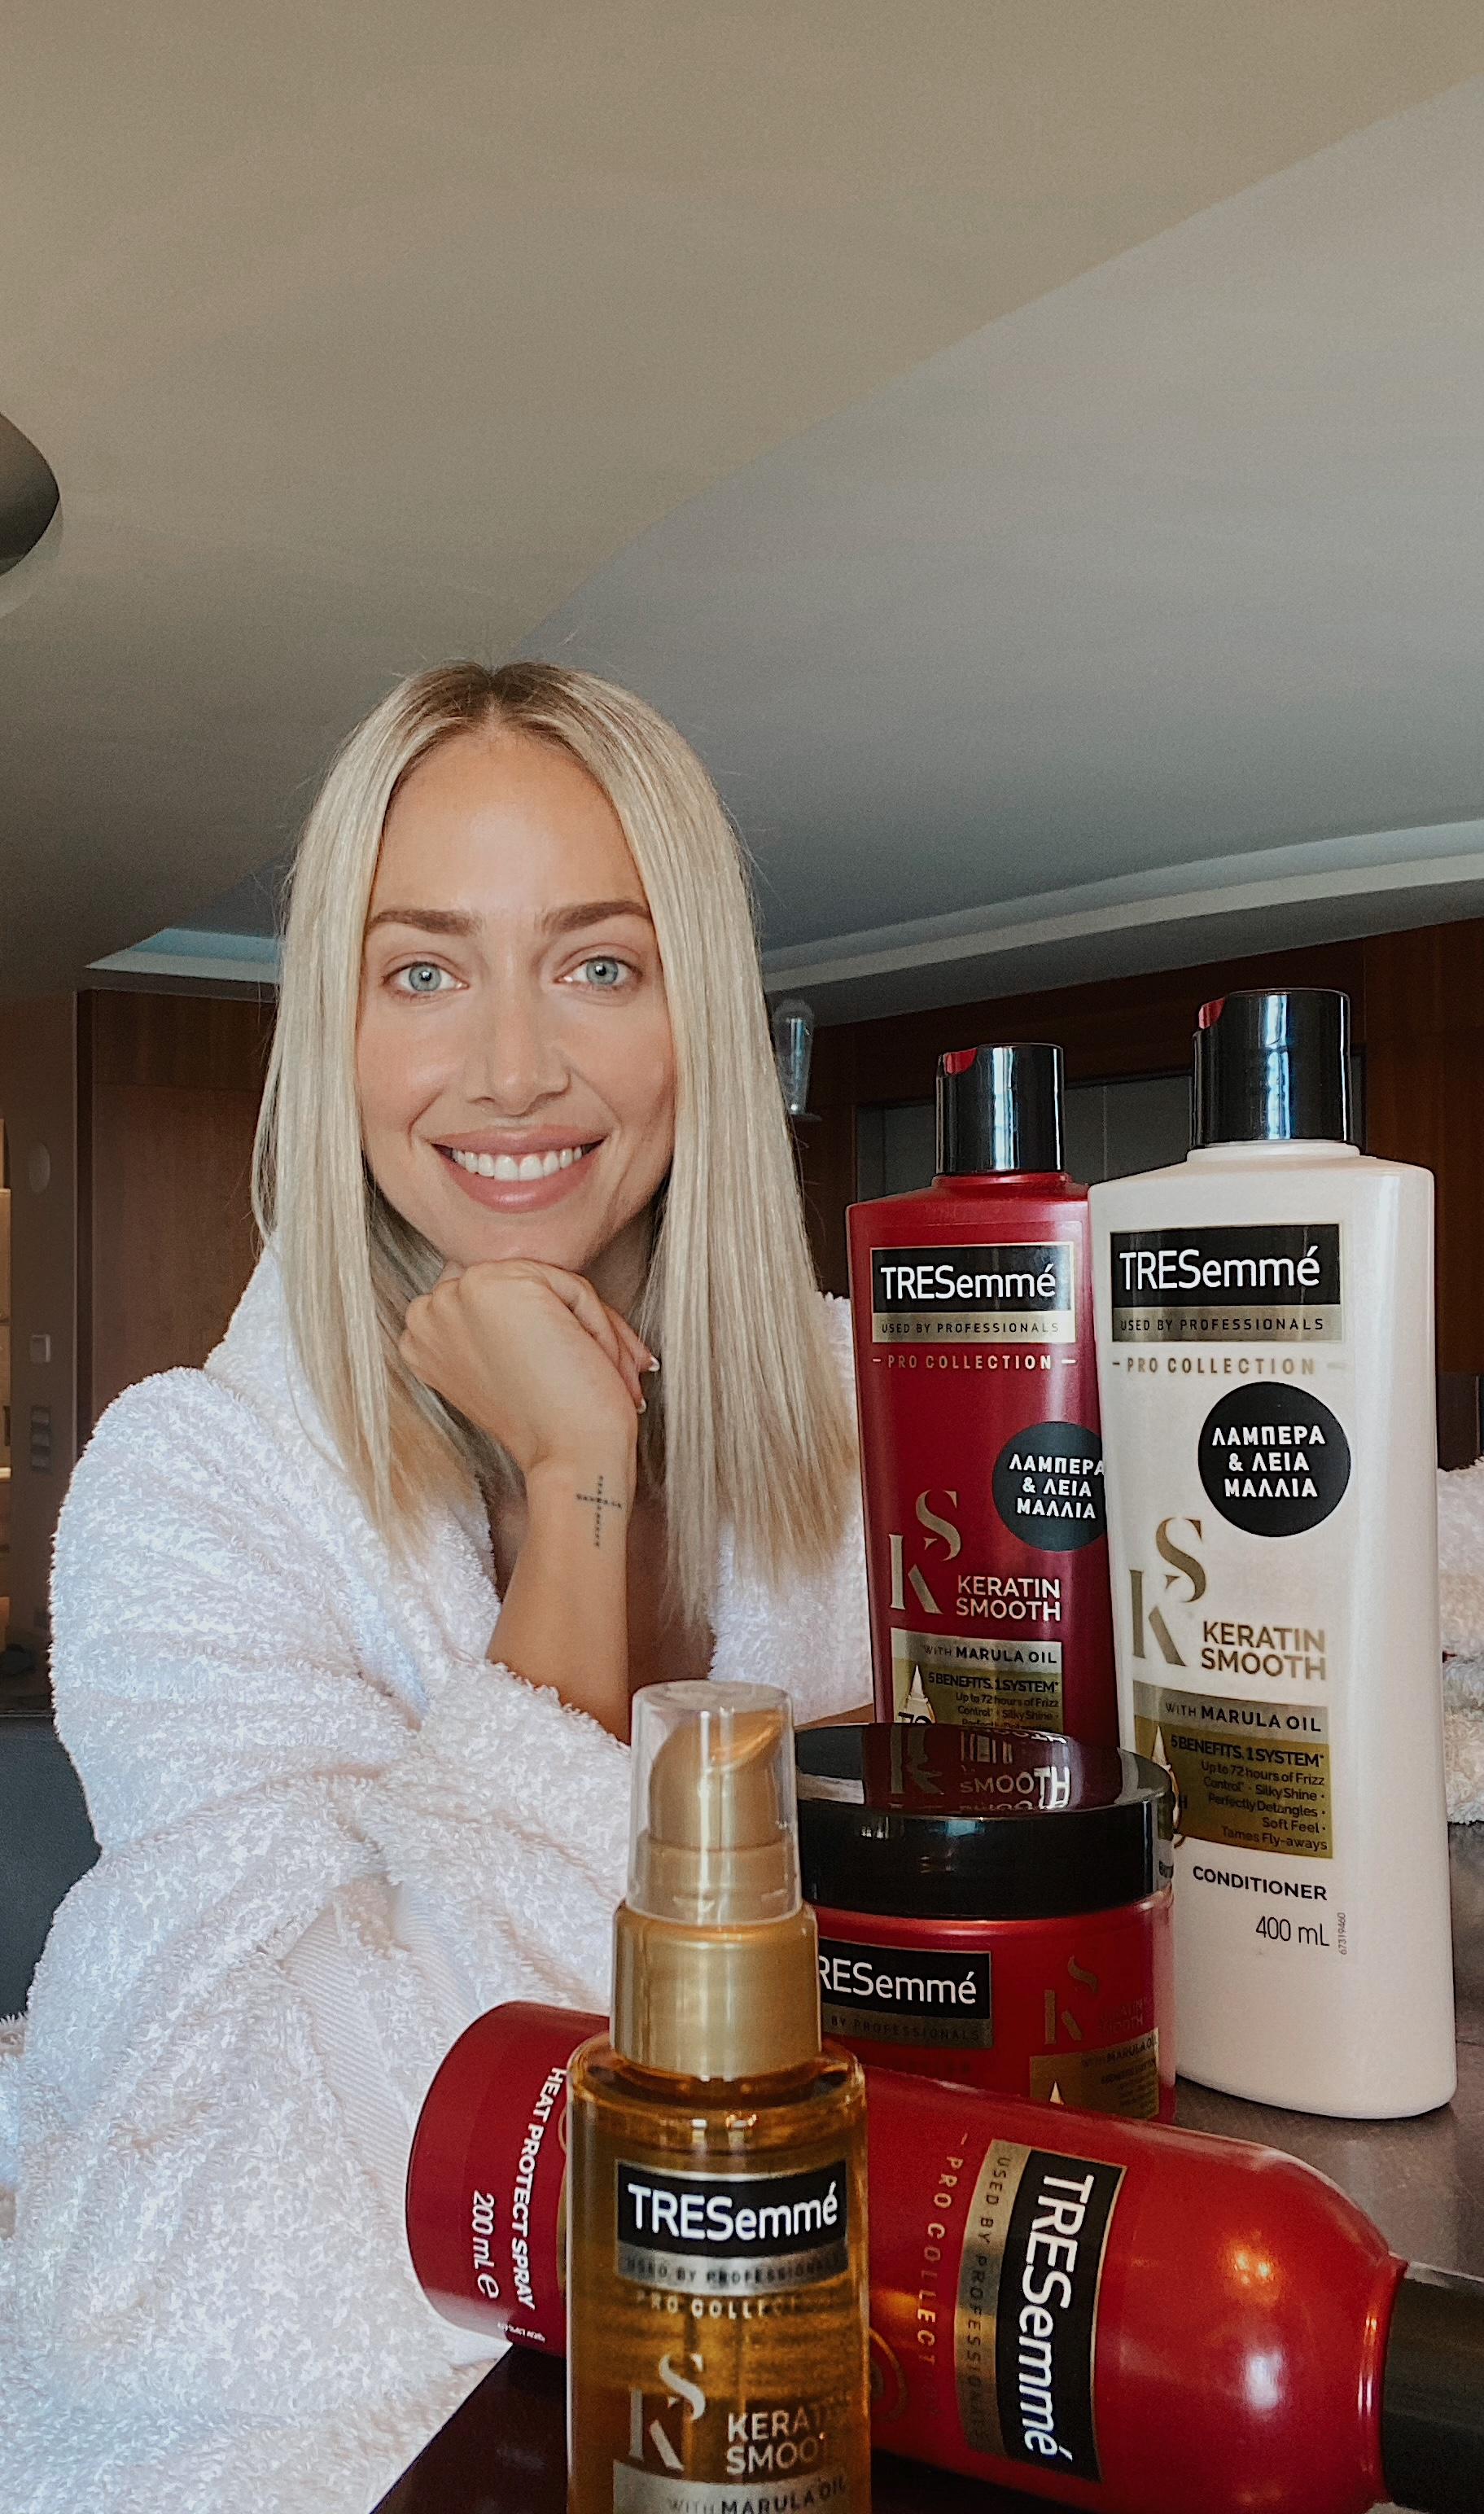 tresemme evaggelinou keratin hair challenge 2